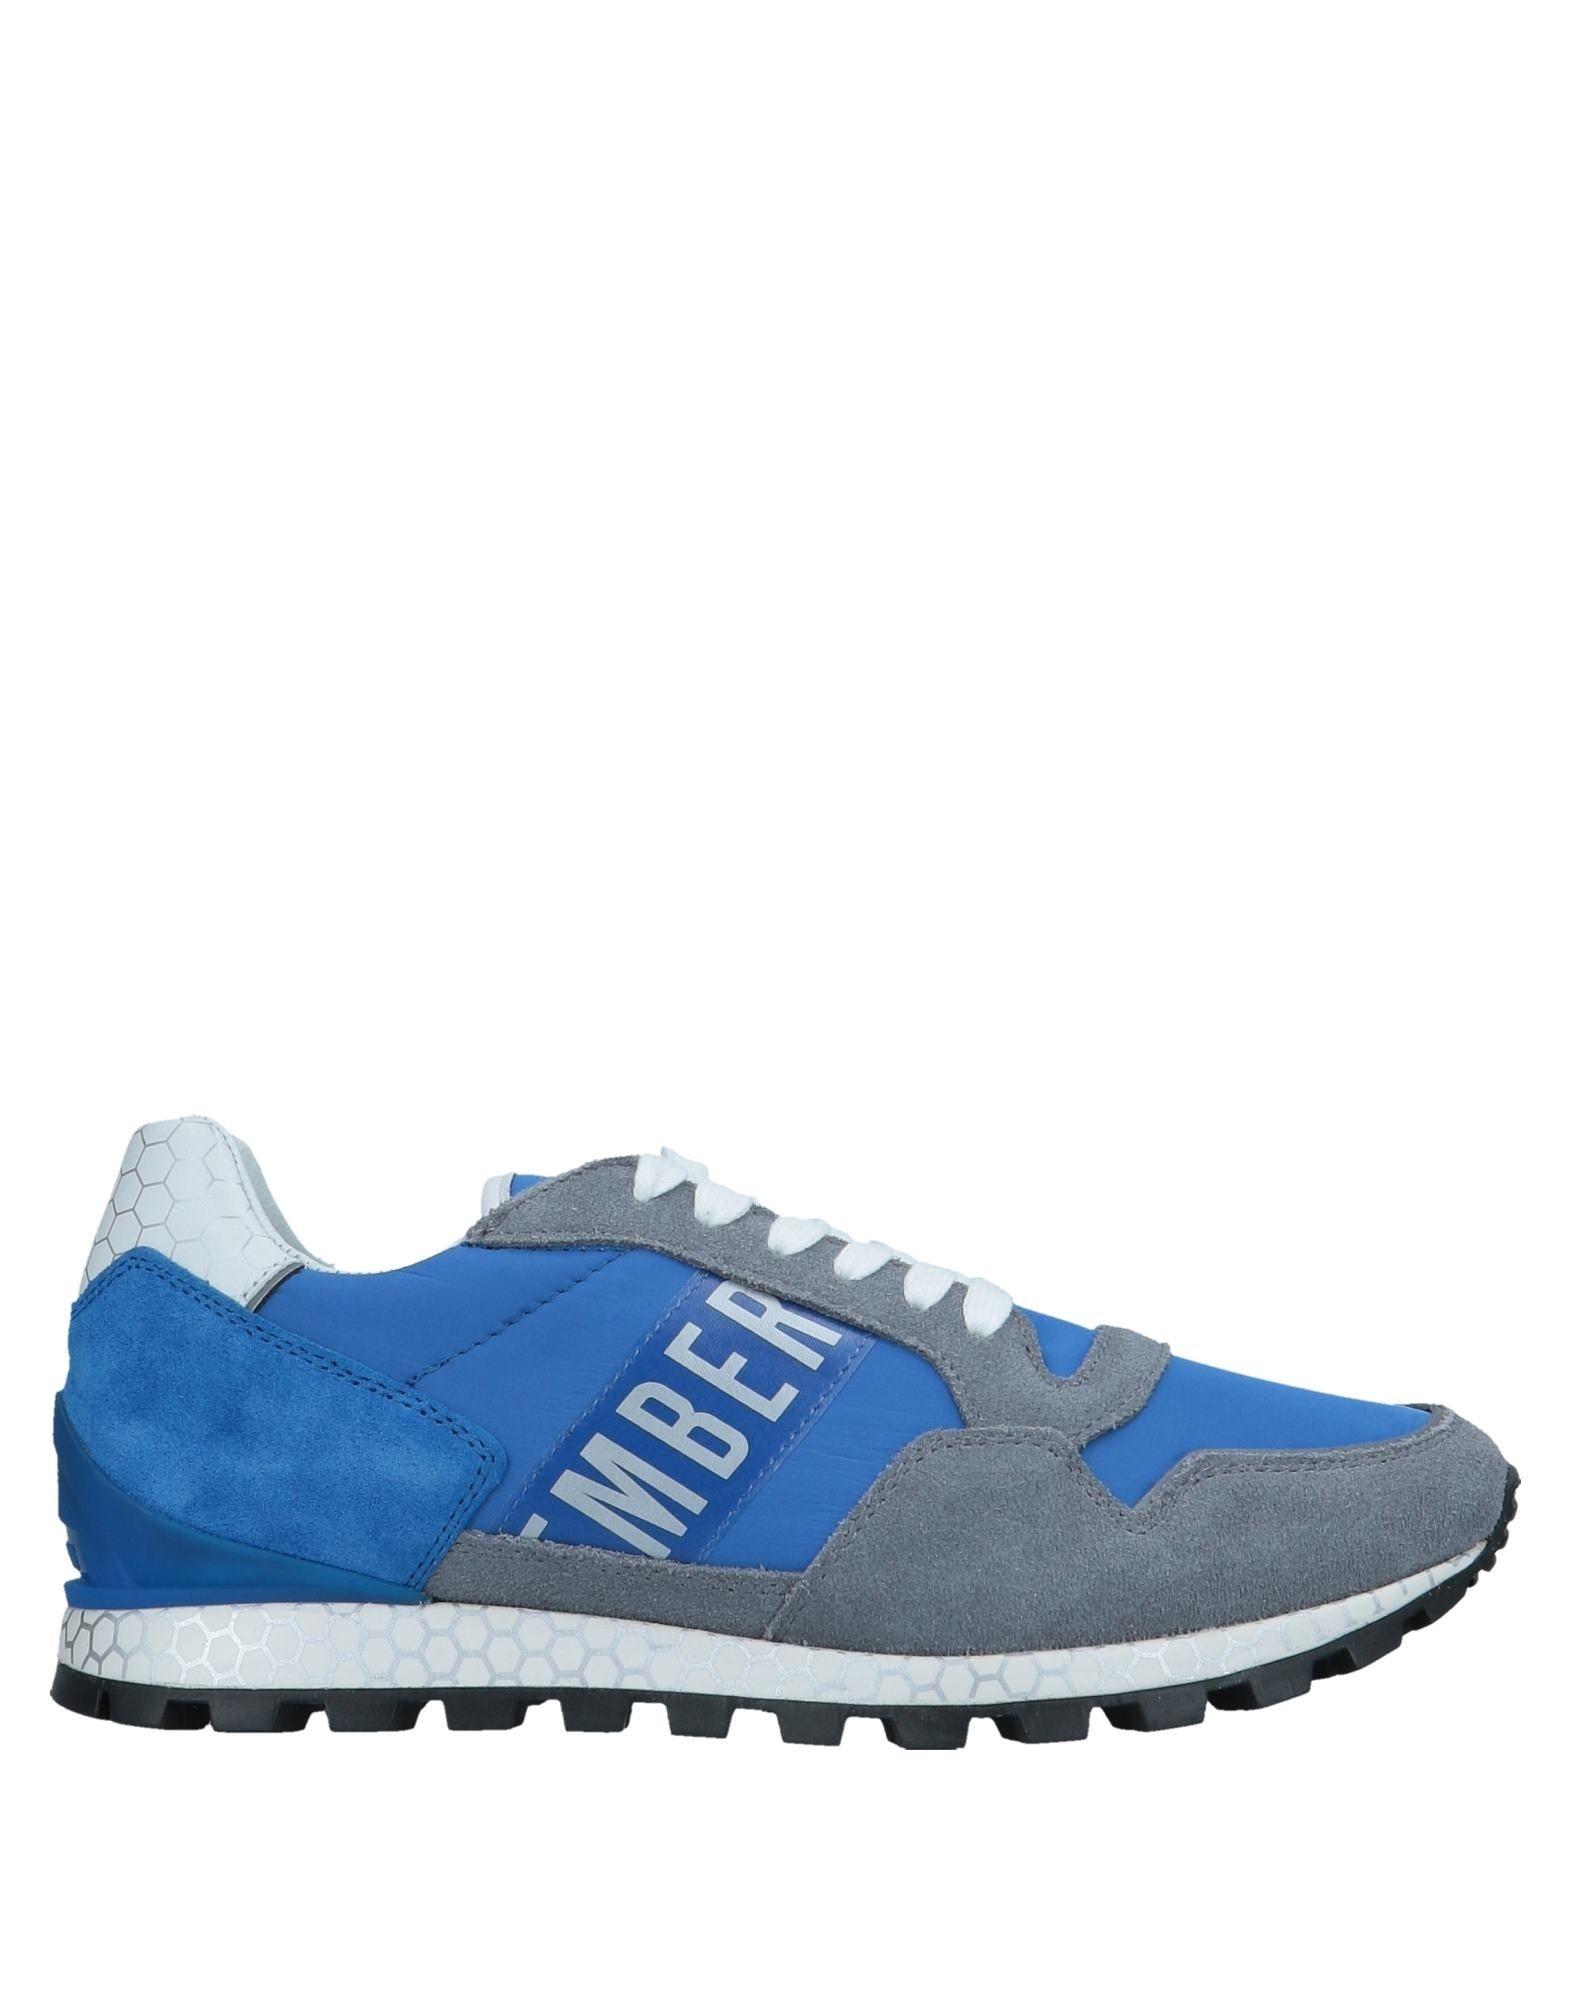 Bikkembergs Sneakers - on Men Bikkembergs Sneakers online on -  United Kingdom - 11569116AW 968de1